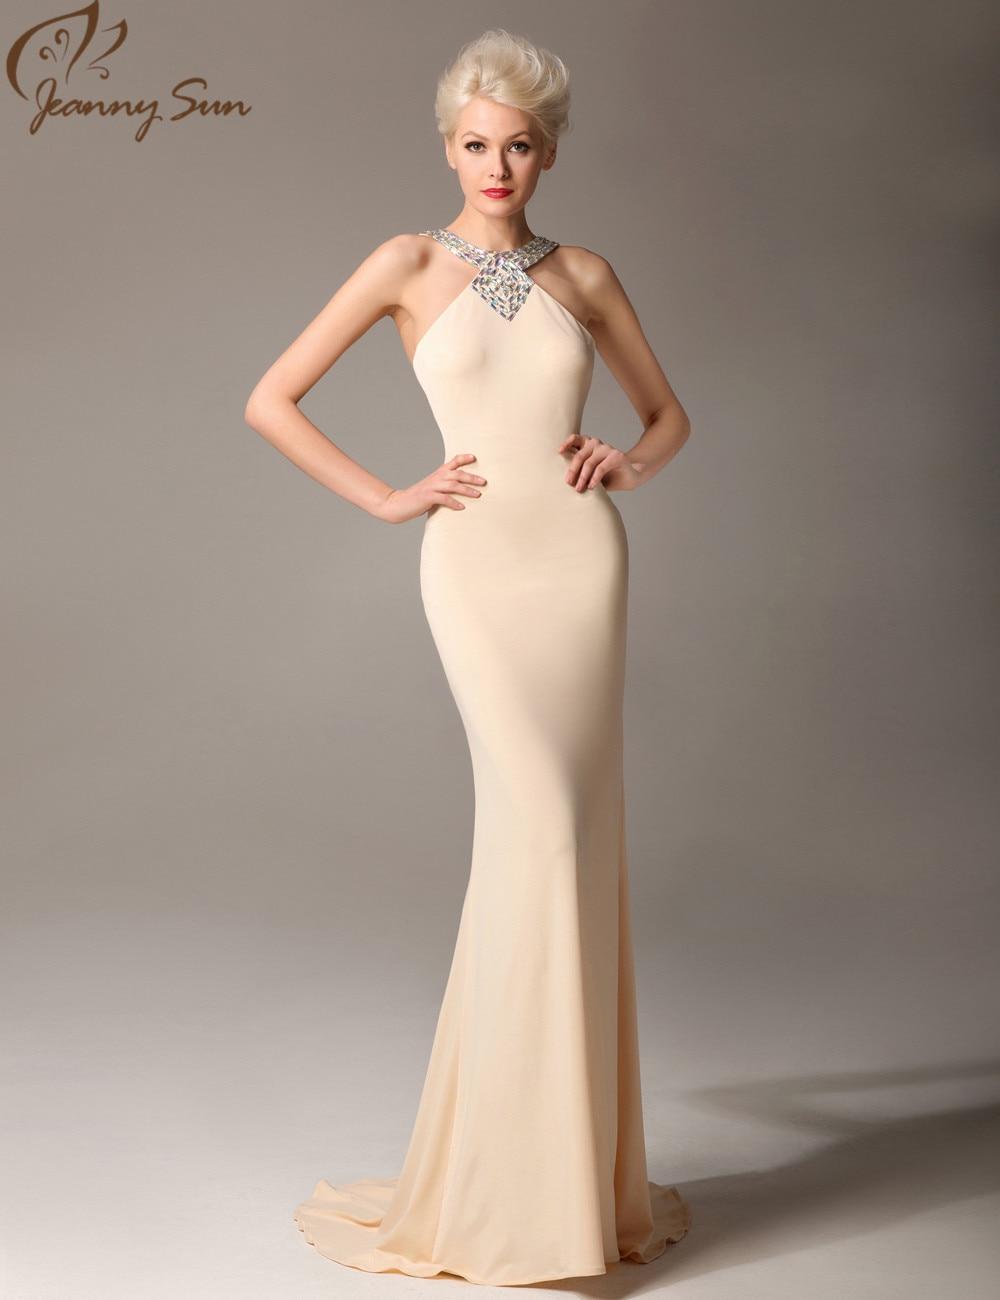 Aliexpress.com : Buy Jeanny Sun Beautiful Evening Dresses with ...